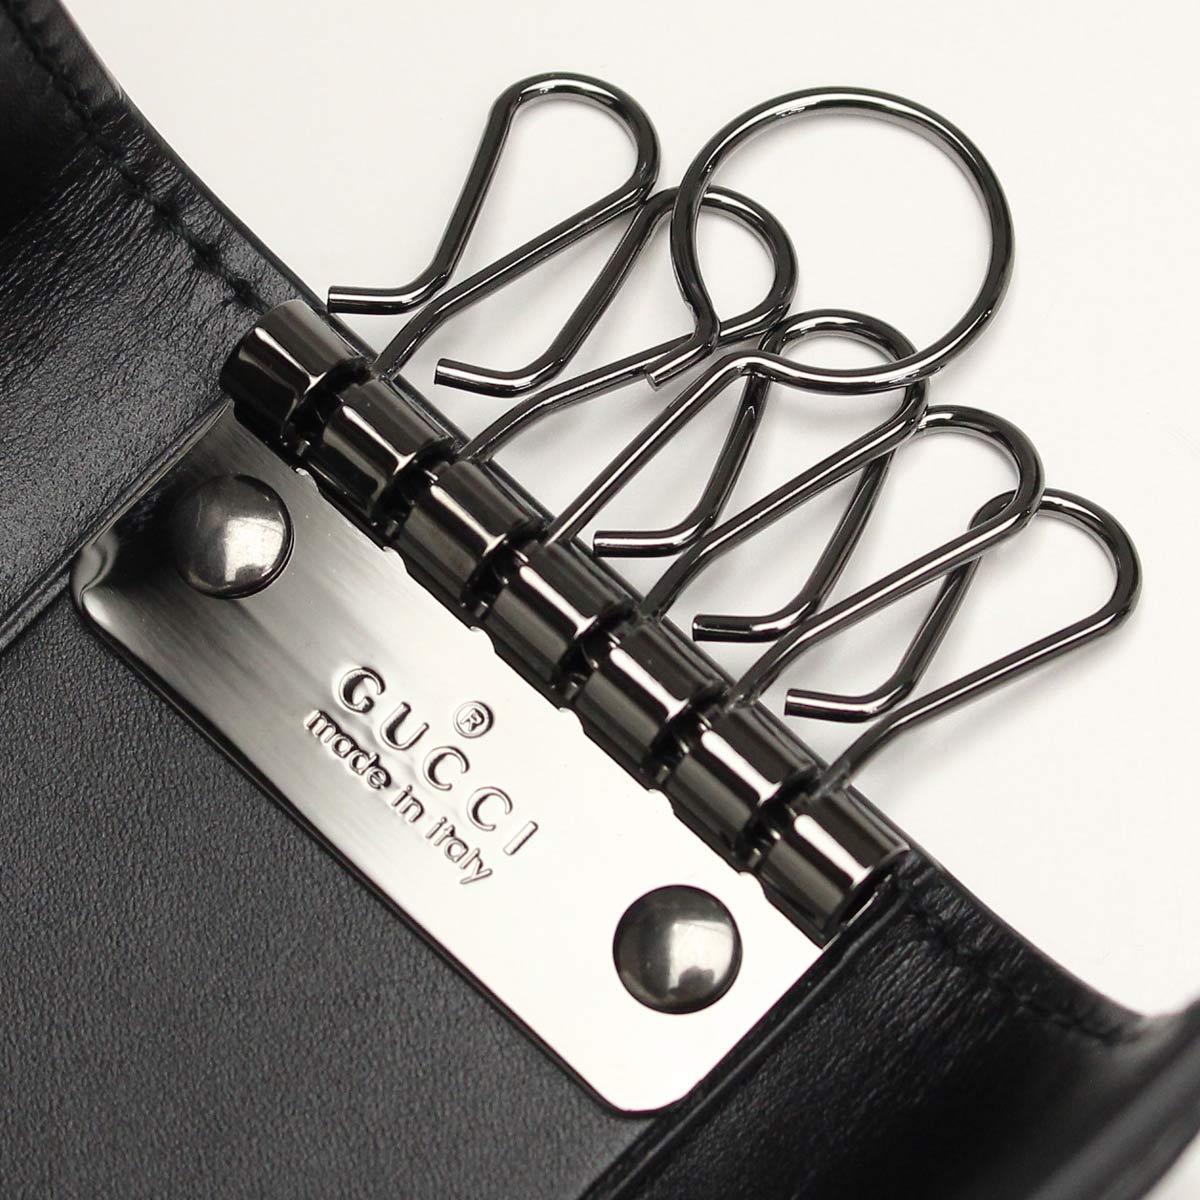 ed45860c90f Bighit The total brand wholesale  Gucci (GUCCI) MEN BAR 6 key holder ...